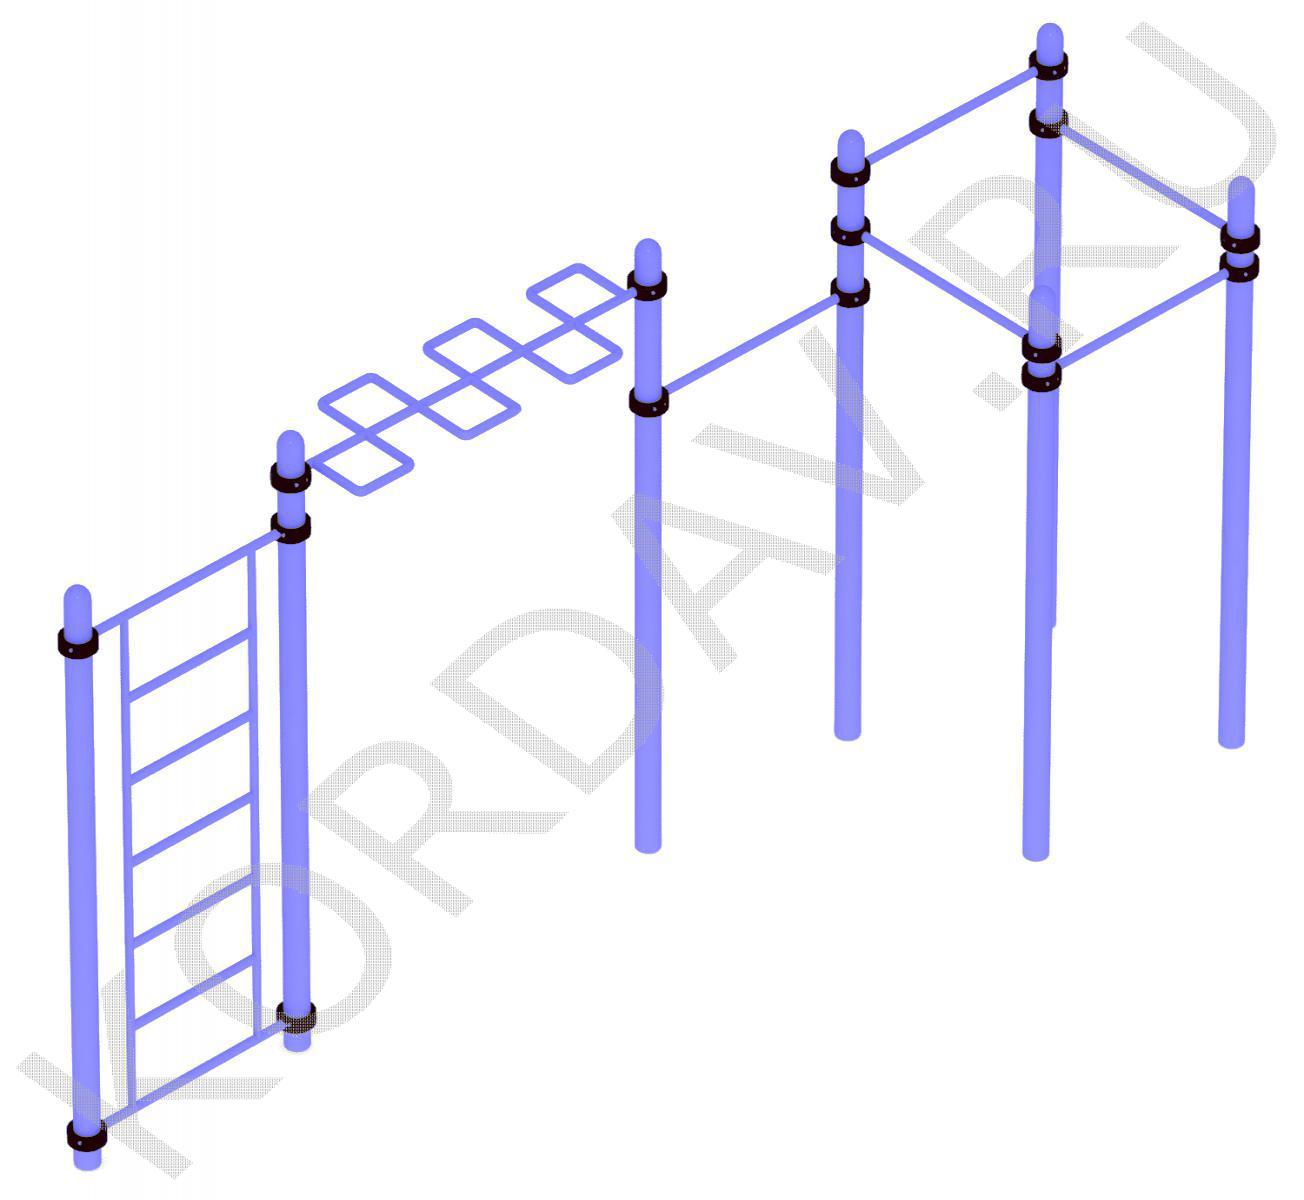 Воркаут шведская стенка, рукоход, каскад турников (108 труба) СТ 1.441